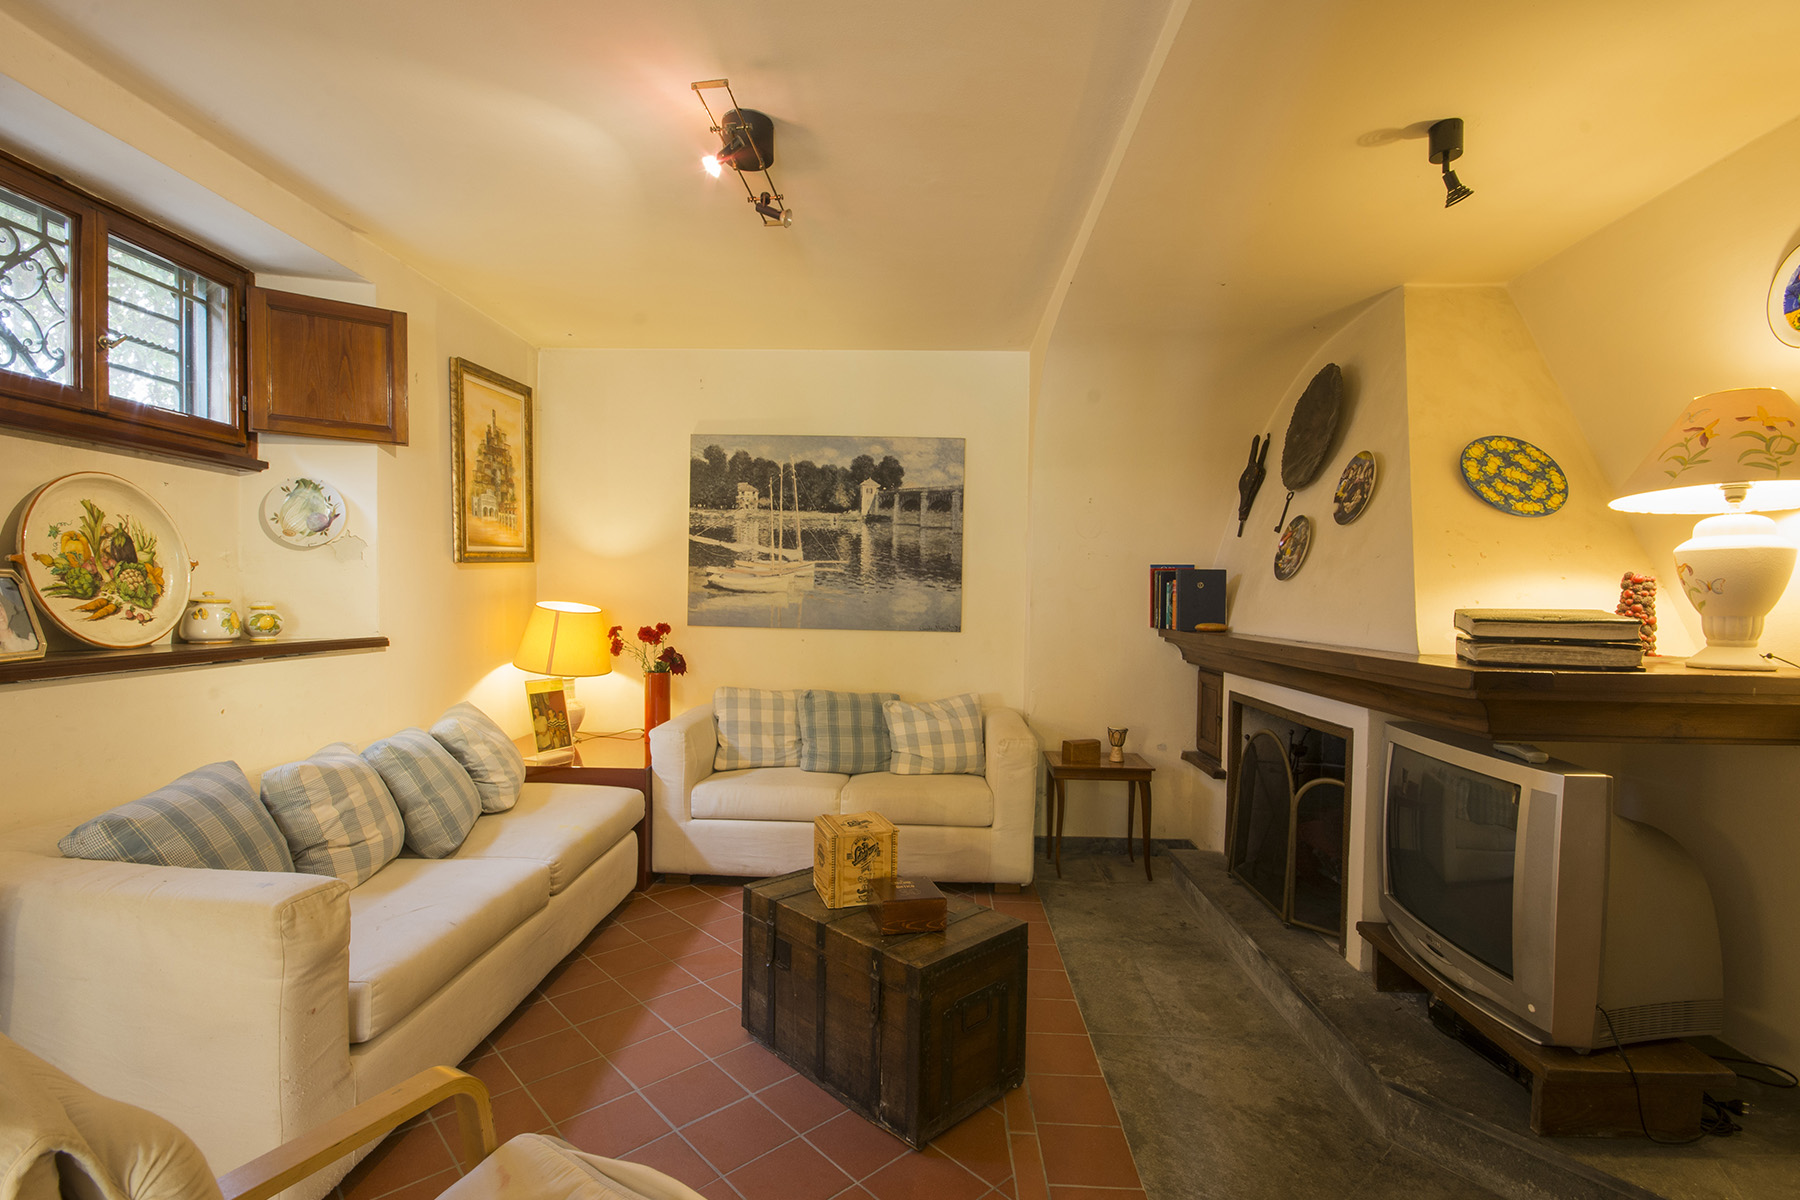 Villa in Vendita a Lucca: 5 locali, 500 mq - Foto 9